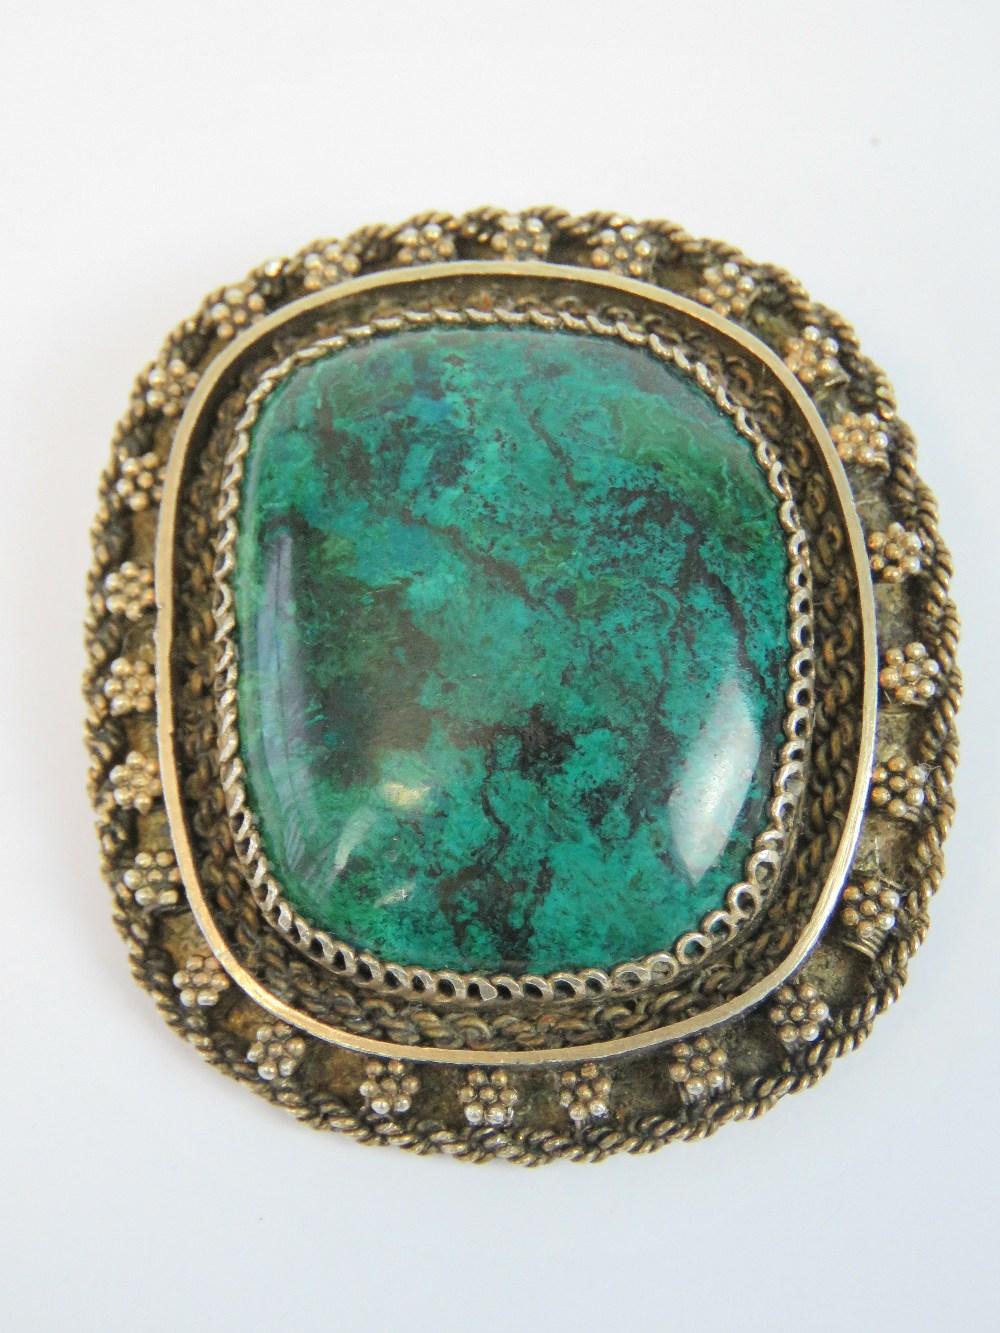 Lot 150 - A 935 Mexican silver handmade brooch/pen